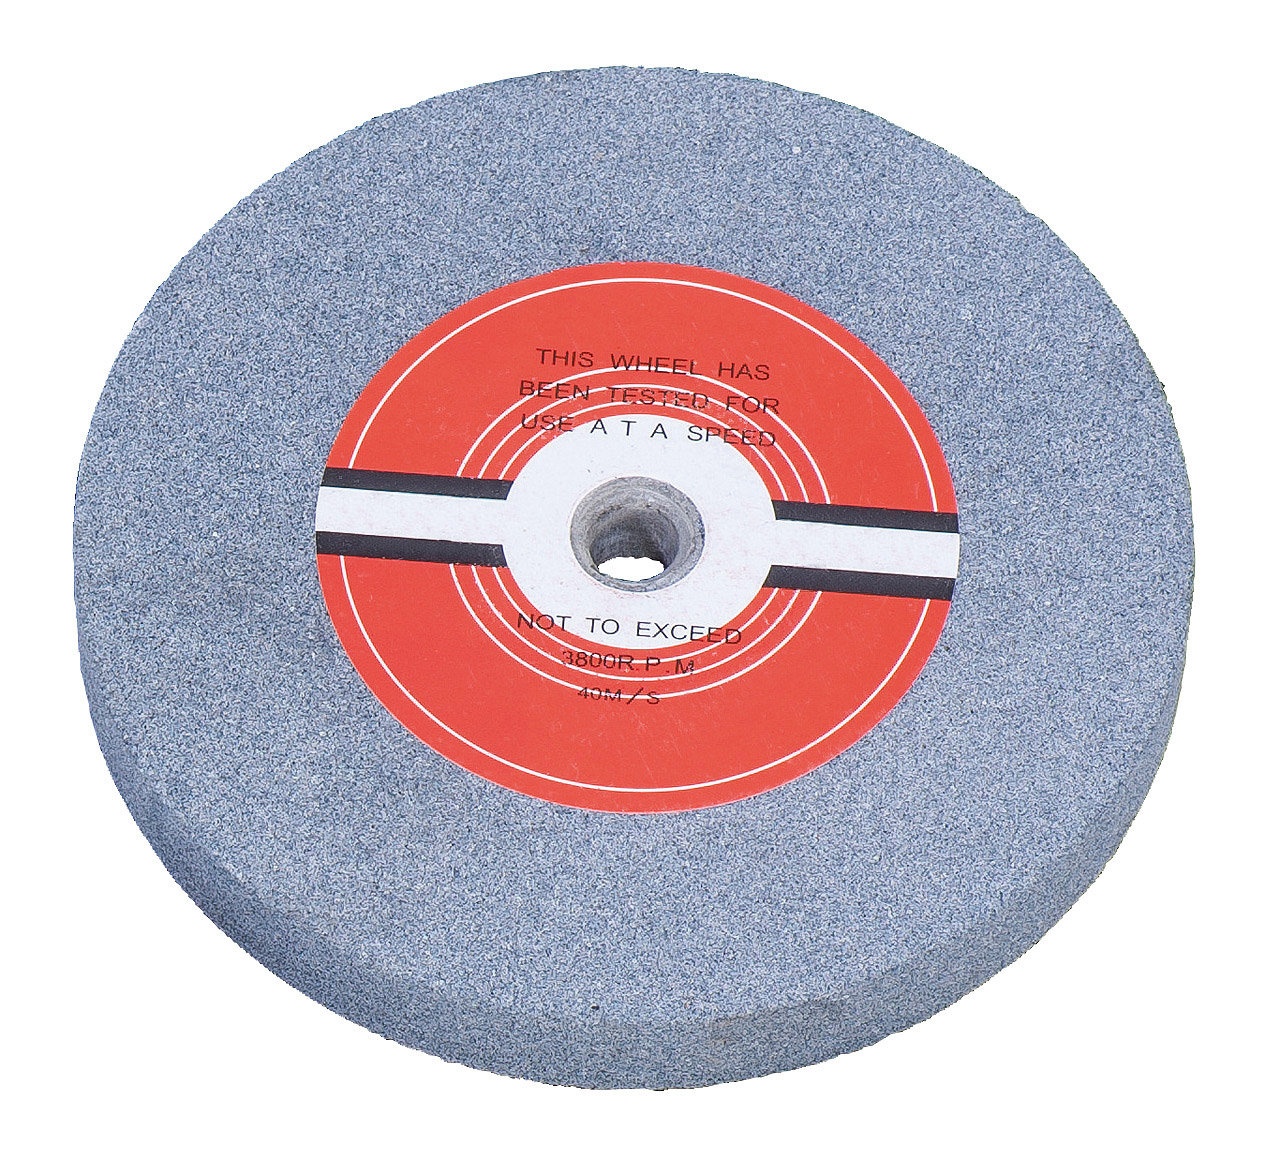 Tarcza szlifierska (tlenek glinu) twarda Ø 300 x 50 mm, Ø 75 mm, G 36    BERNARDO